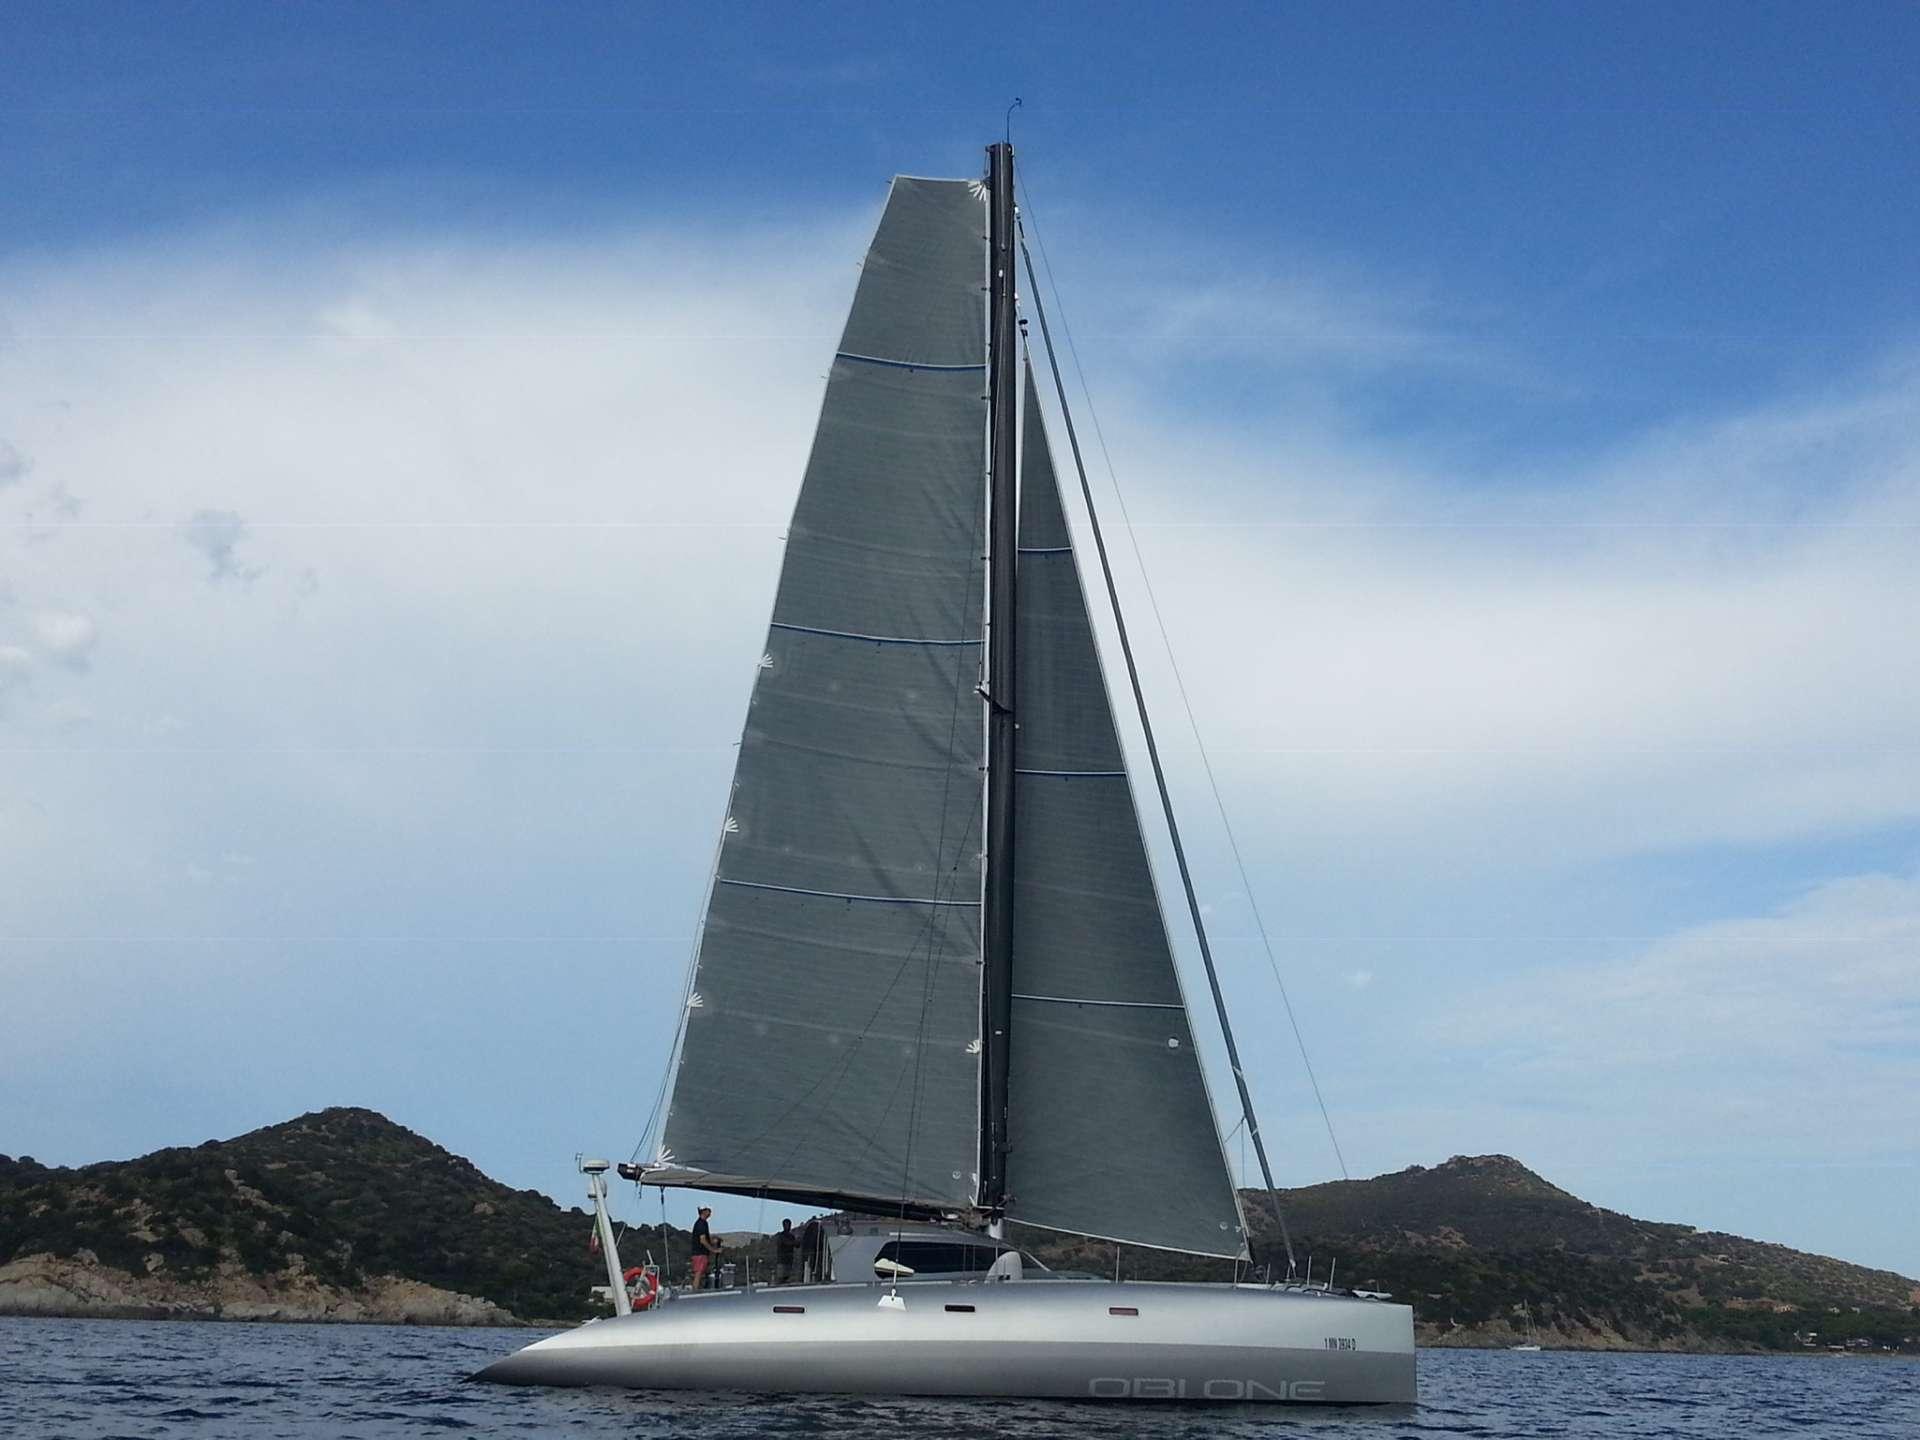 Catamaran Obi One